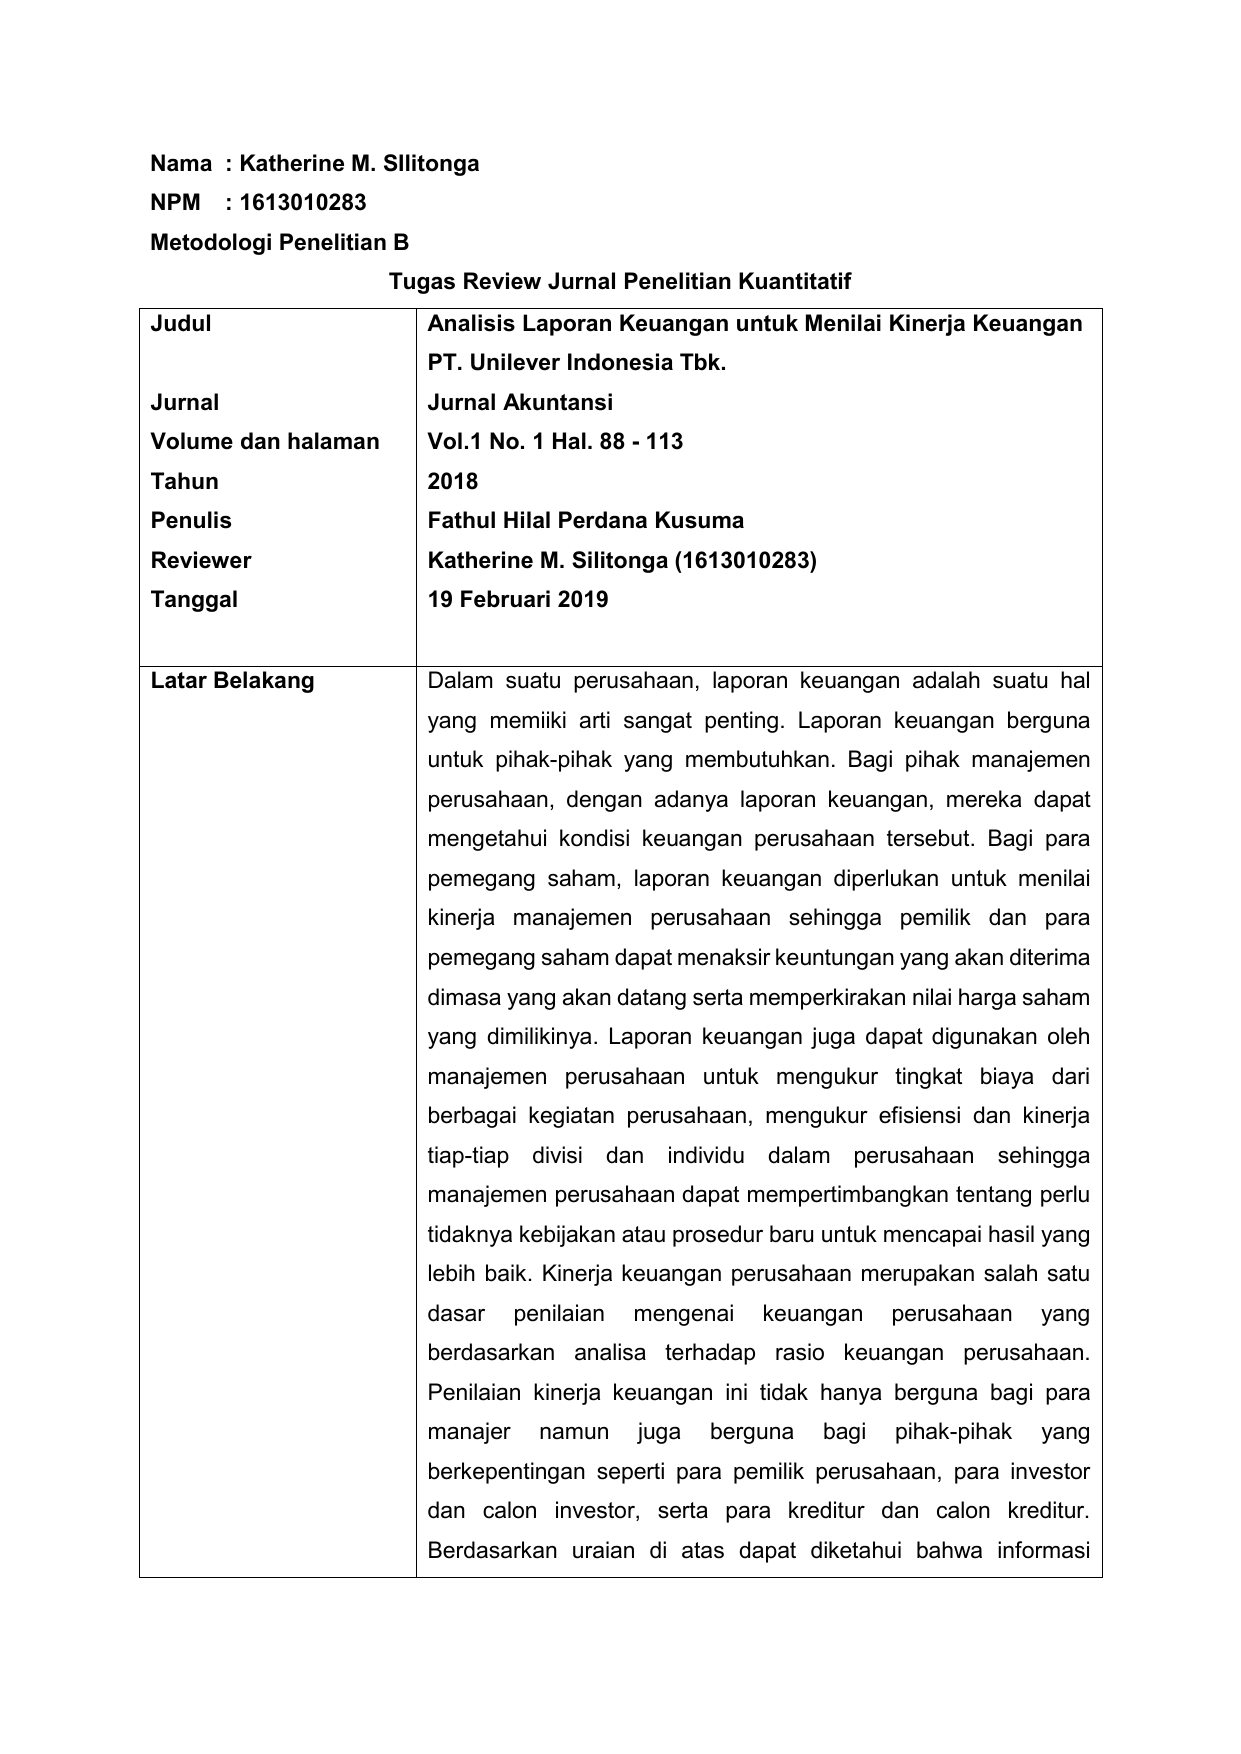 Contoh Tugas Review Jurnal